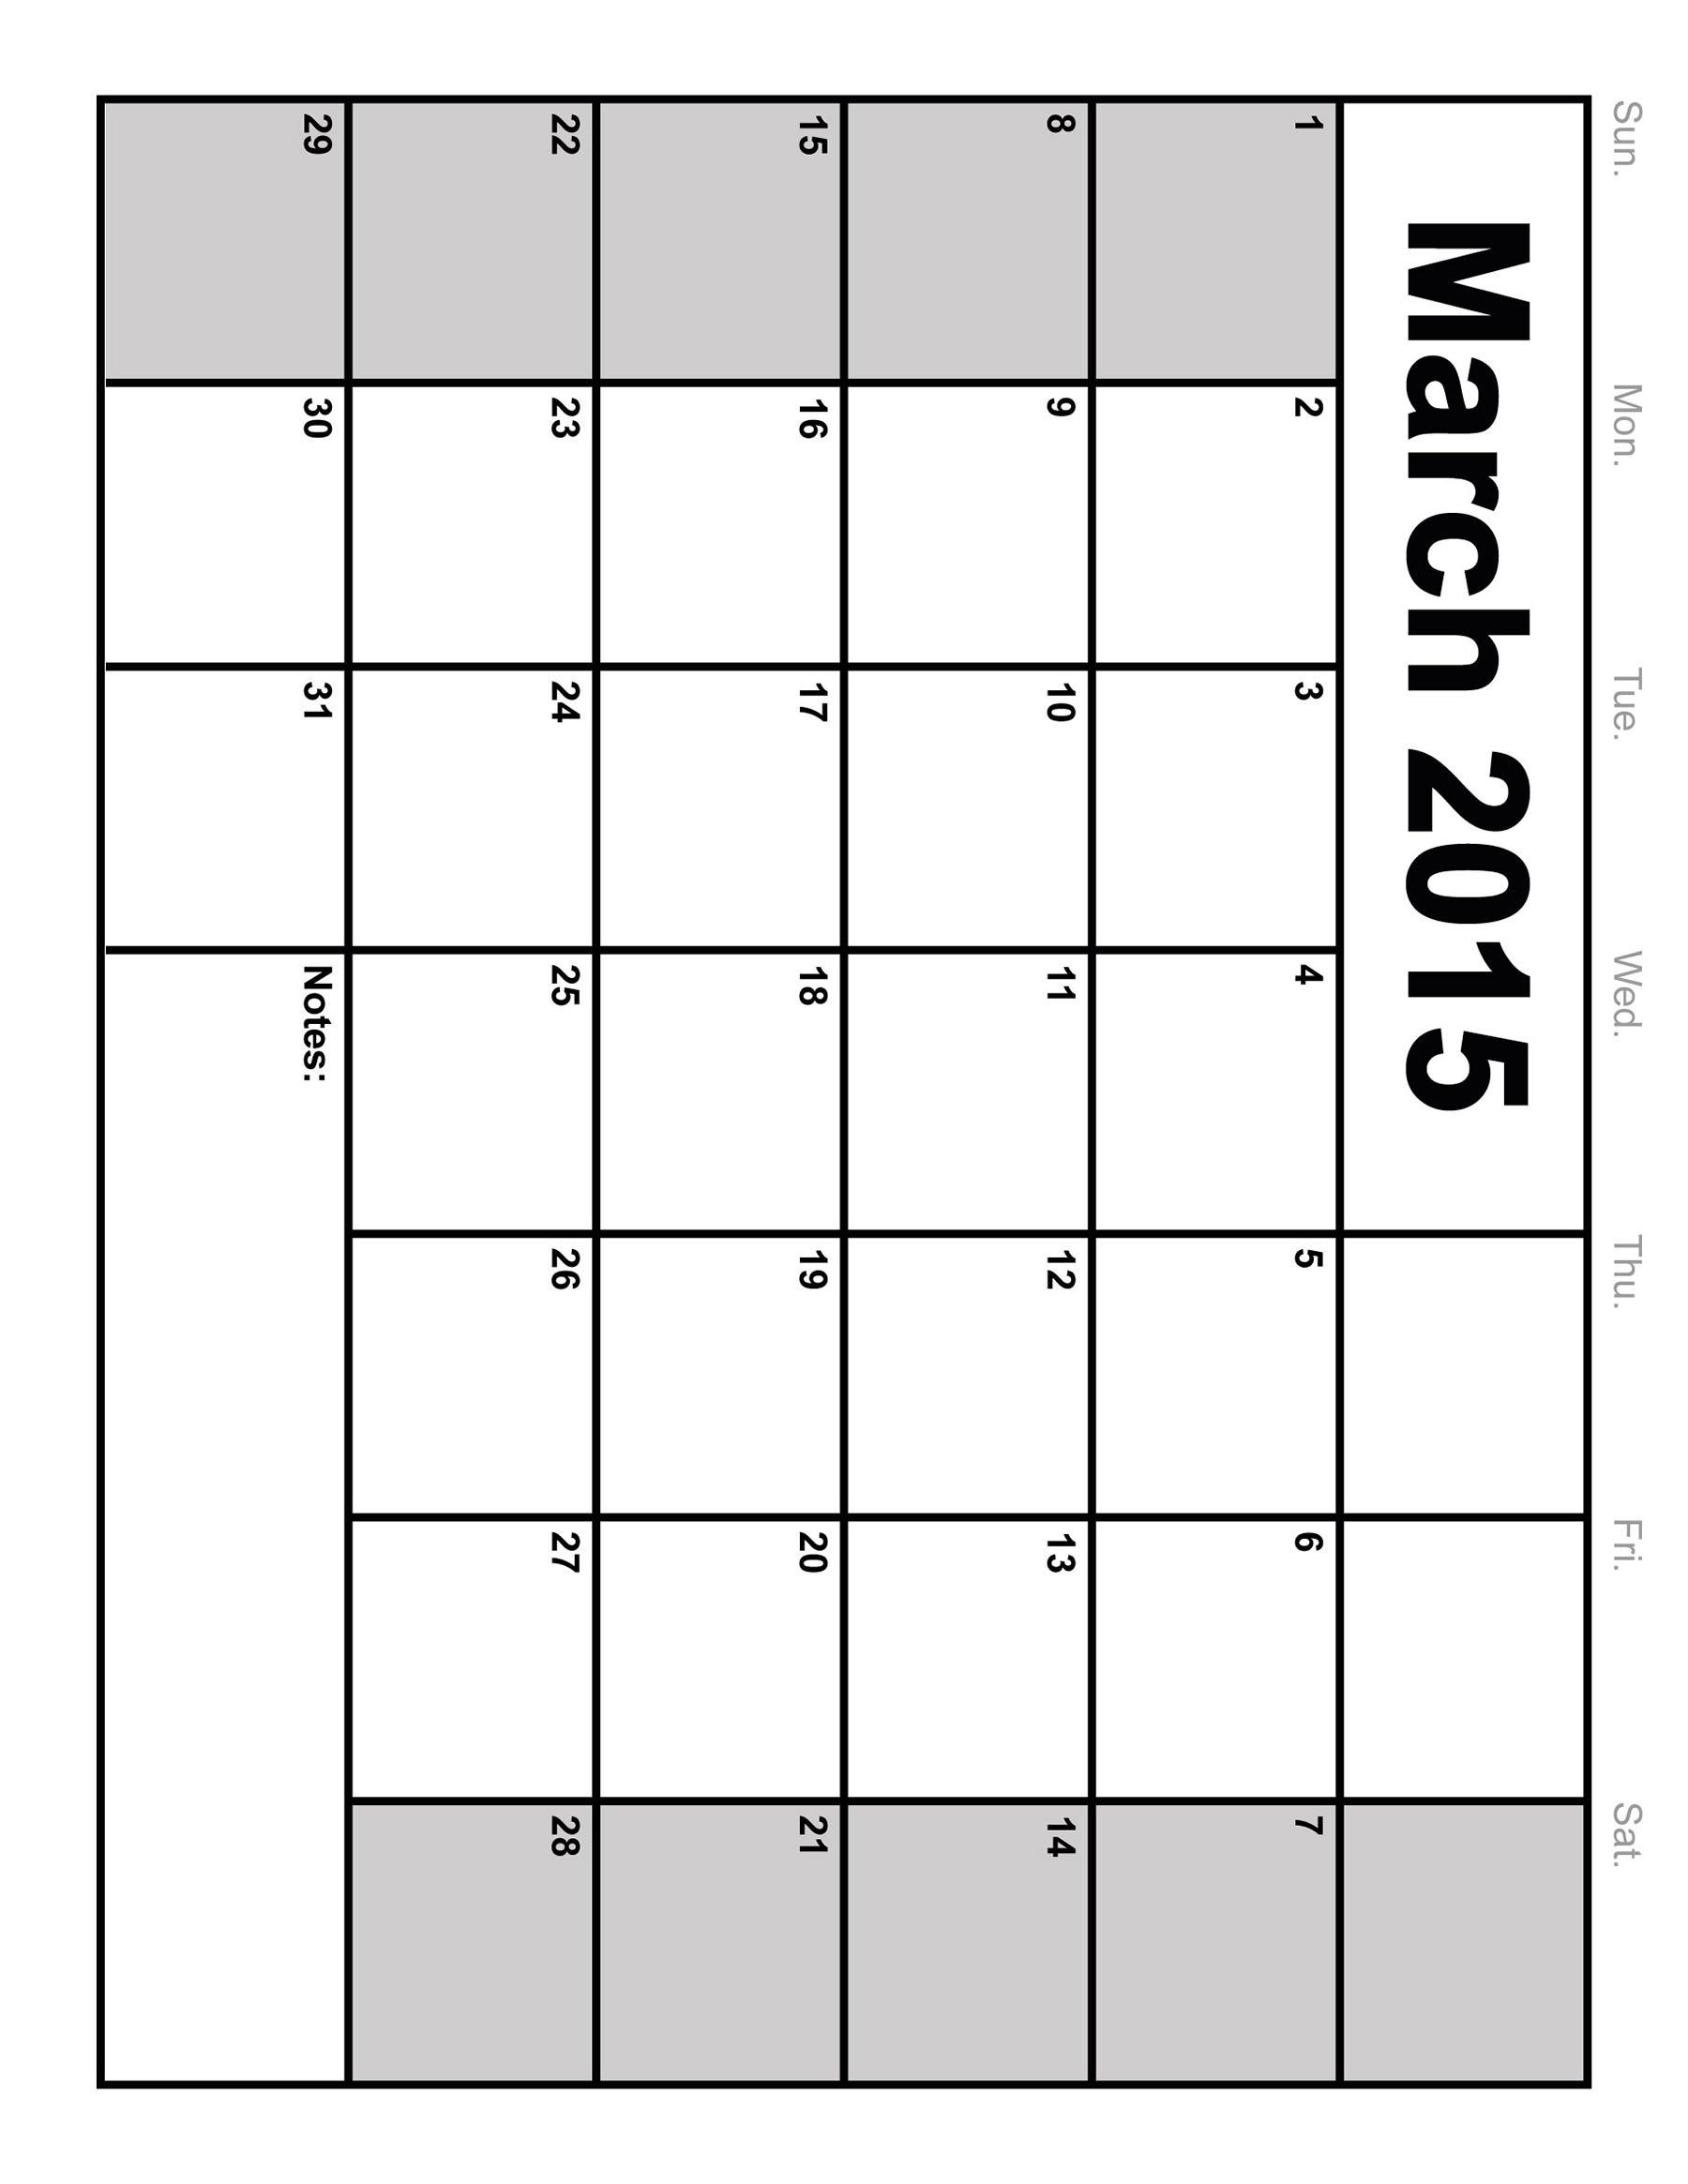 Love Kawaii Snoopy March 2015 Wallpaper Calendar Chainimage 89uj